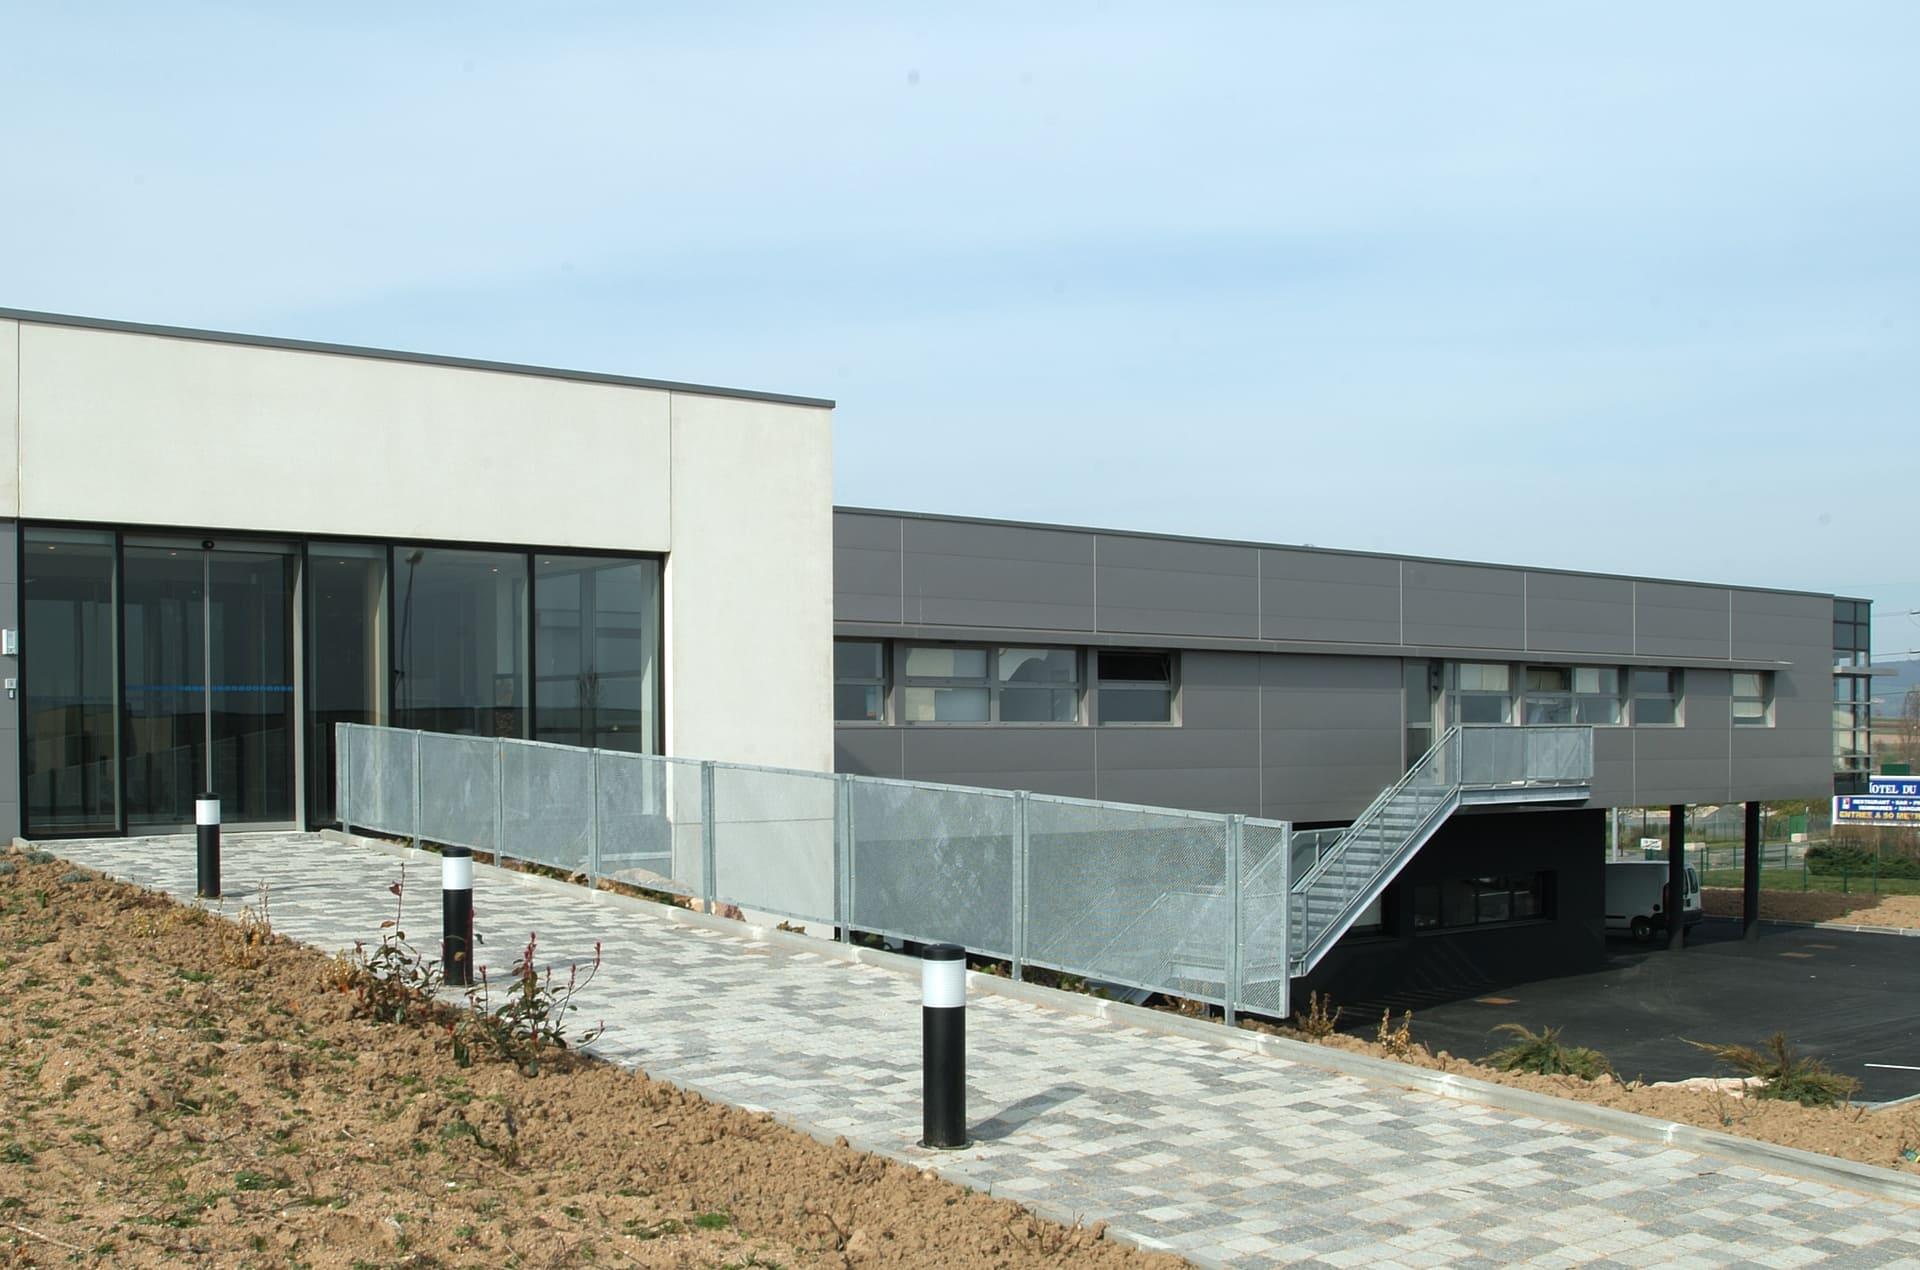 architec-sdel-terrasse